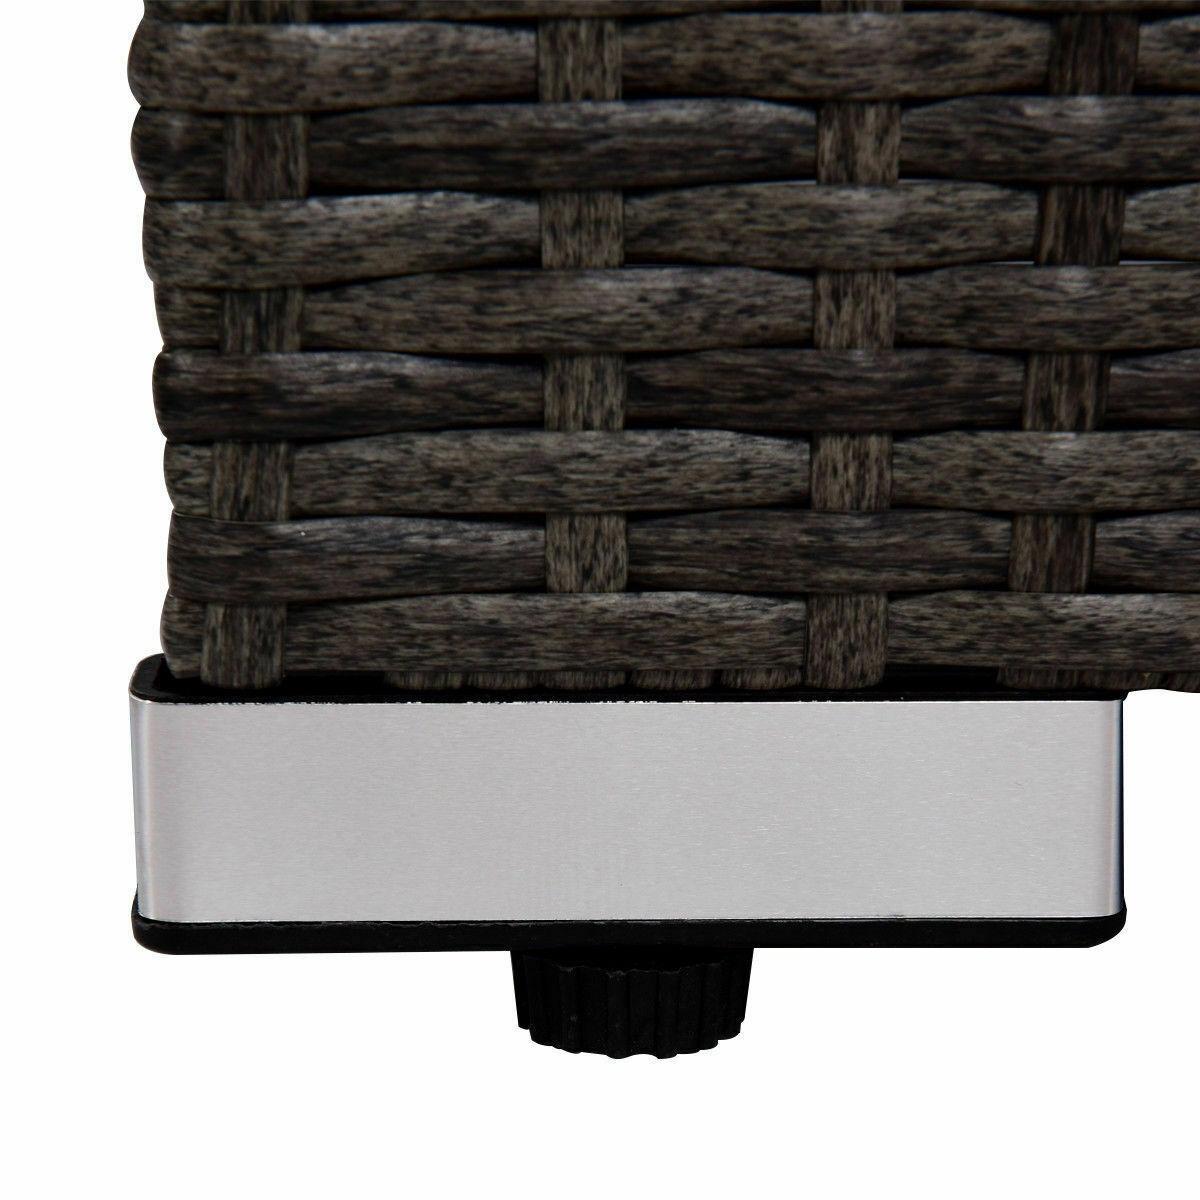 Rattan Wicker Patio Sofa Set with Black Cushion